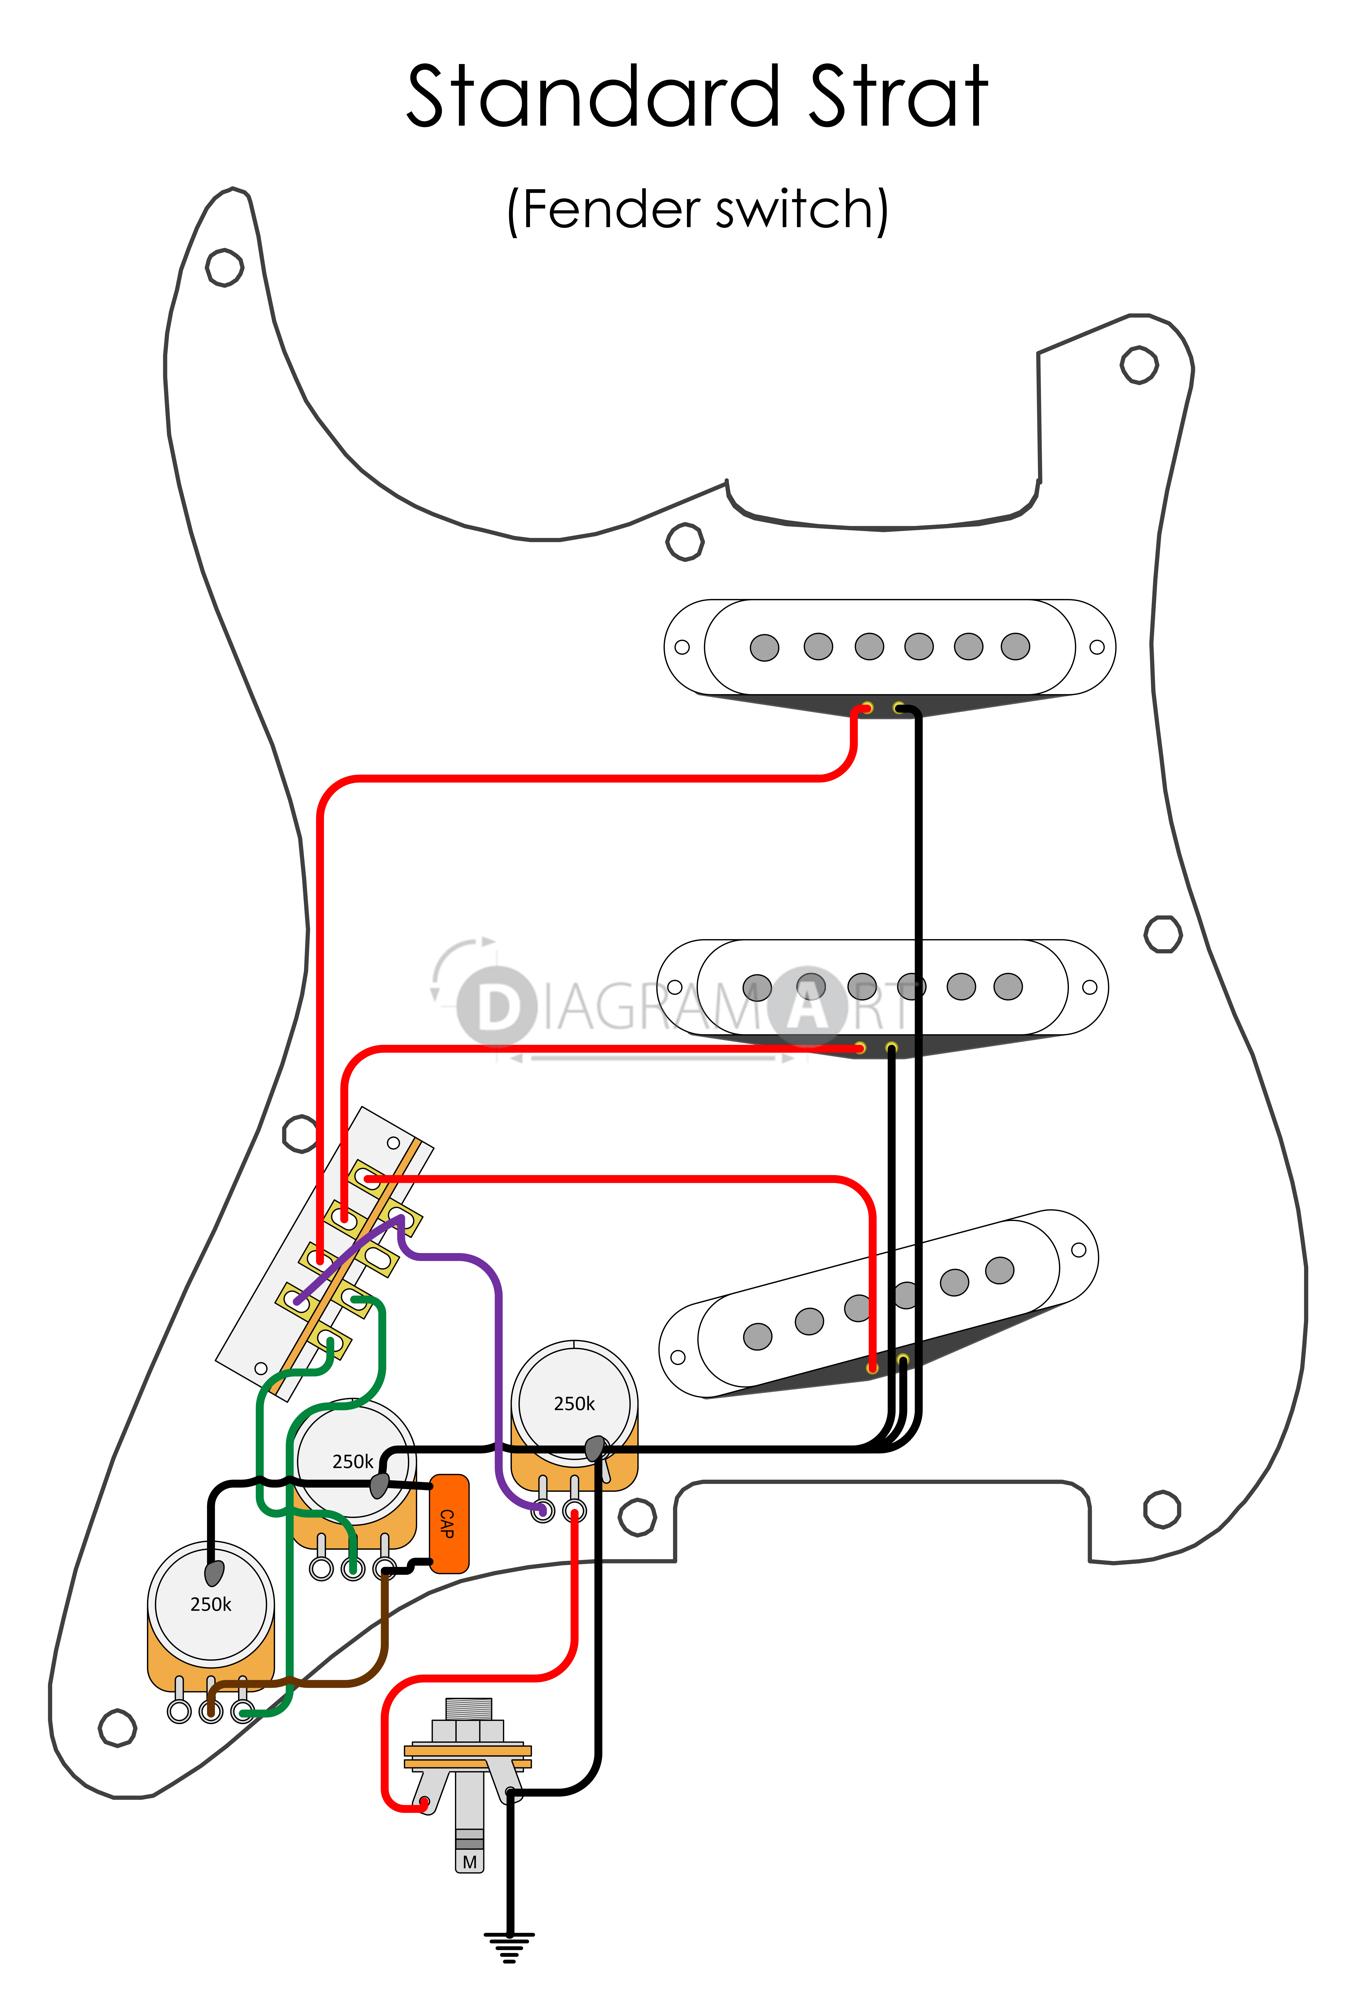 New Epiphone Electric Guitar Wiring Diagram Diagram Diagramsample Diagramtemplate Check More At Https Mo Stratocaster Guitar Luthier Guitar Guitar Pickups